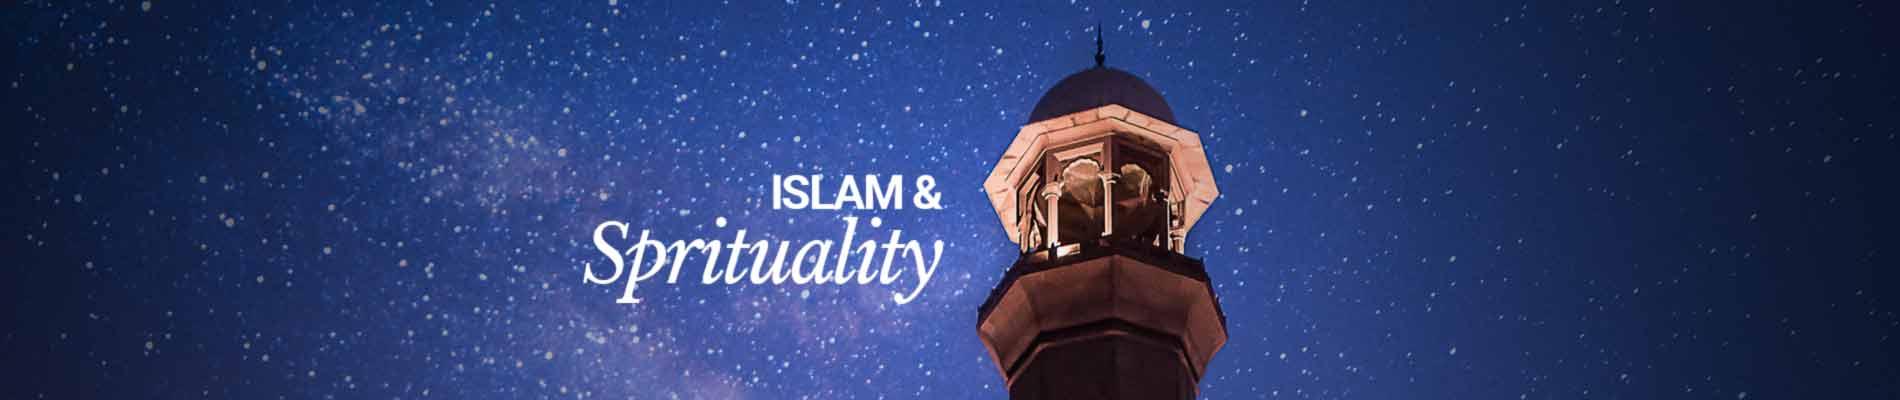 Islam & Spirituality